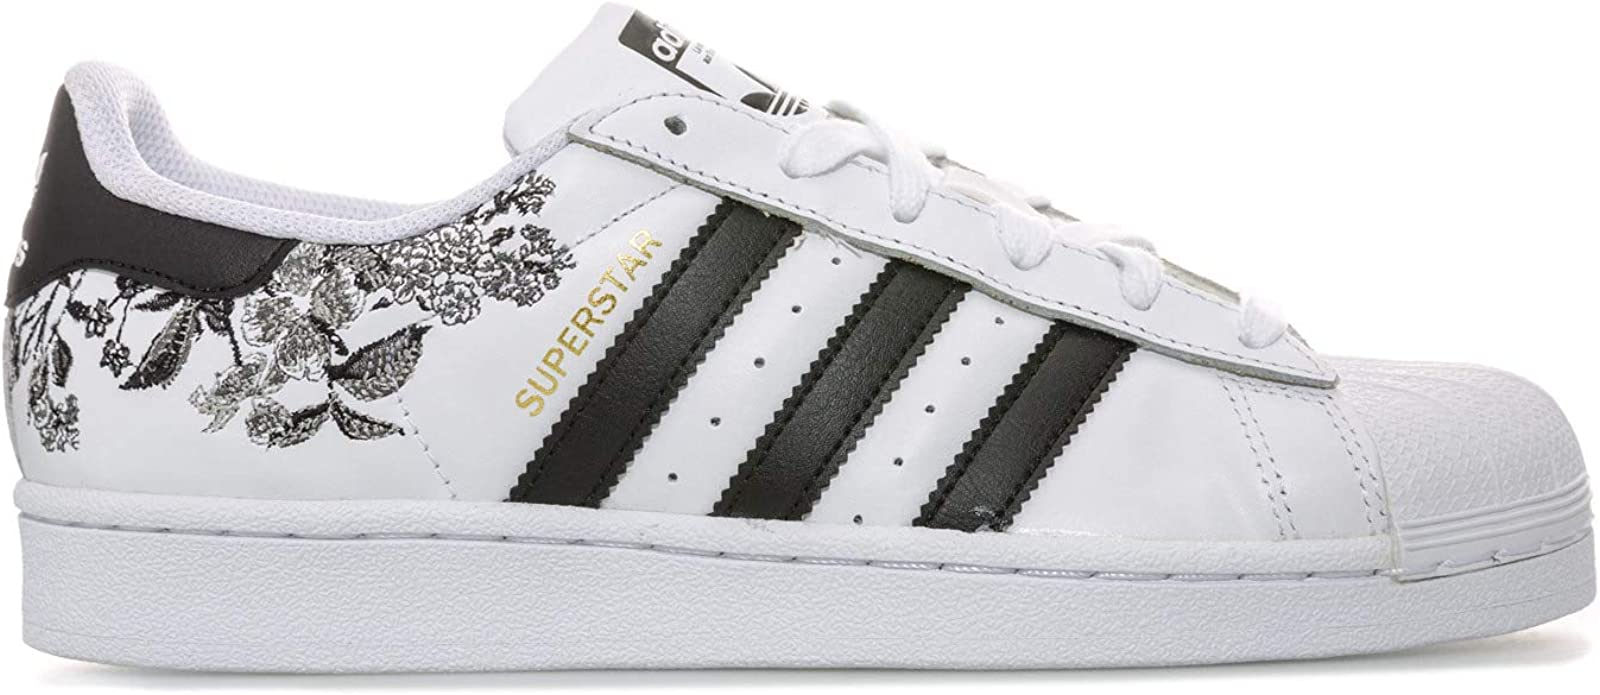 adidas Originals Baskets Superstar Blanc Noir Femme, 37 1/3 EU ...